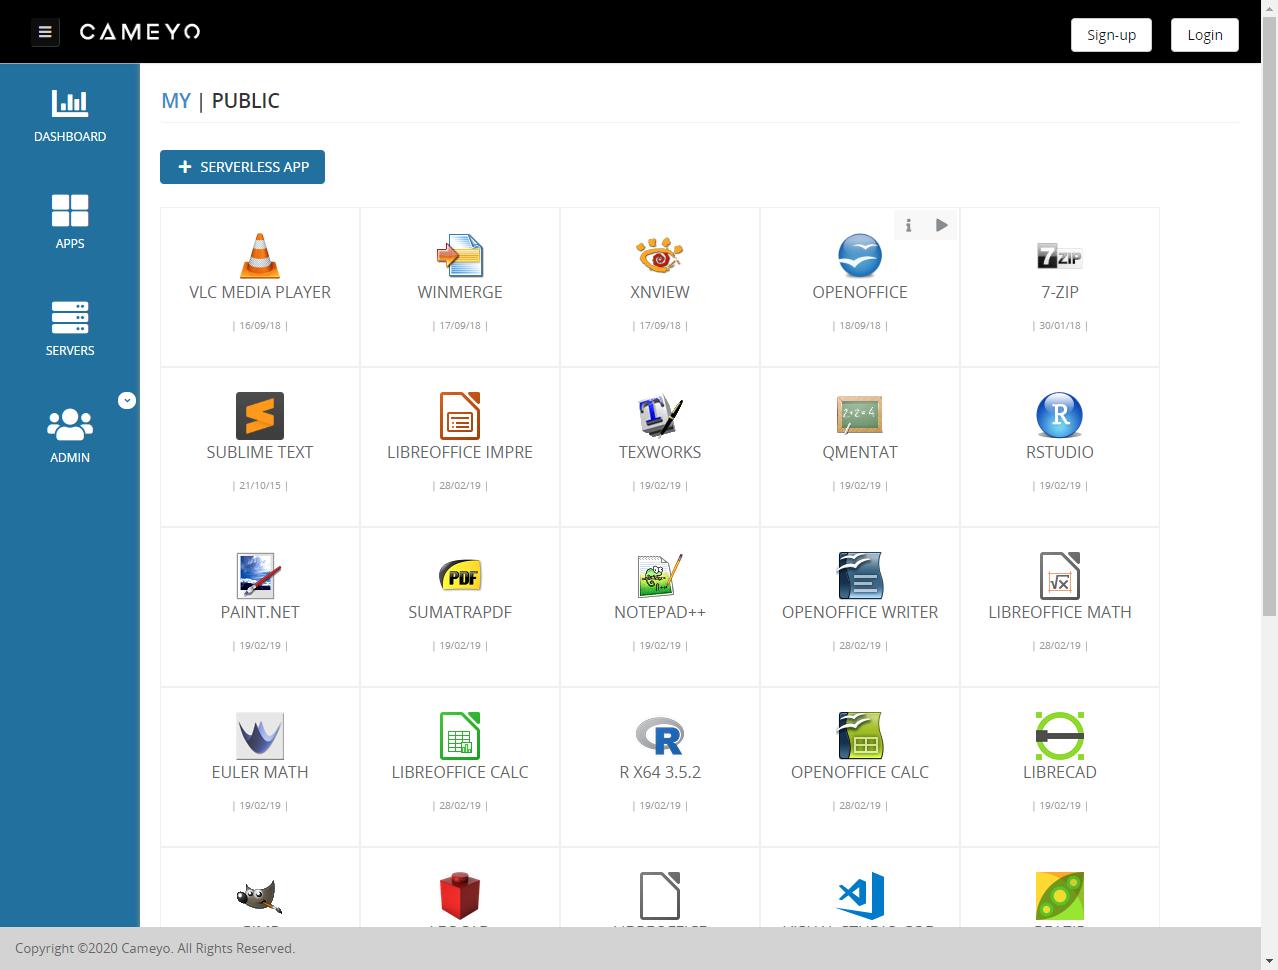 Screenshot of Cameyo's digital workspace solution